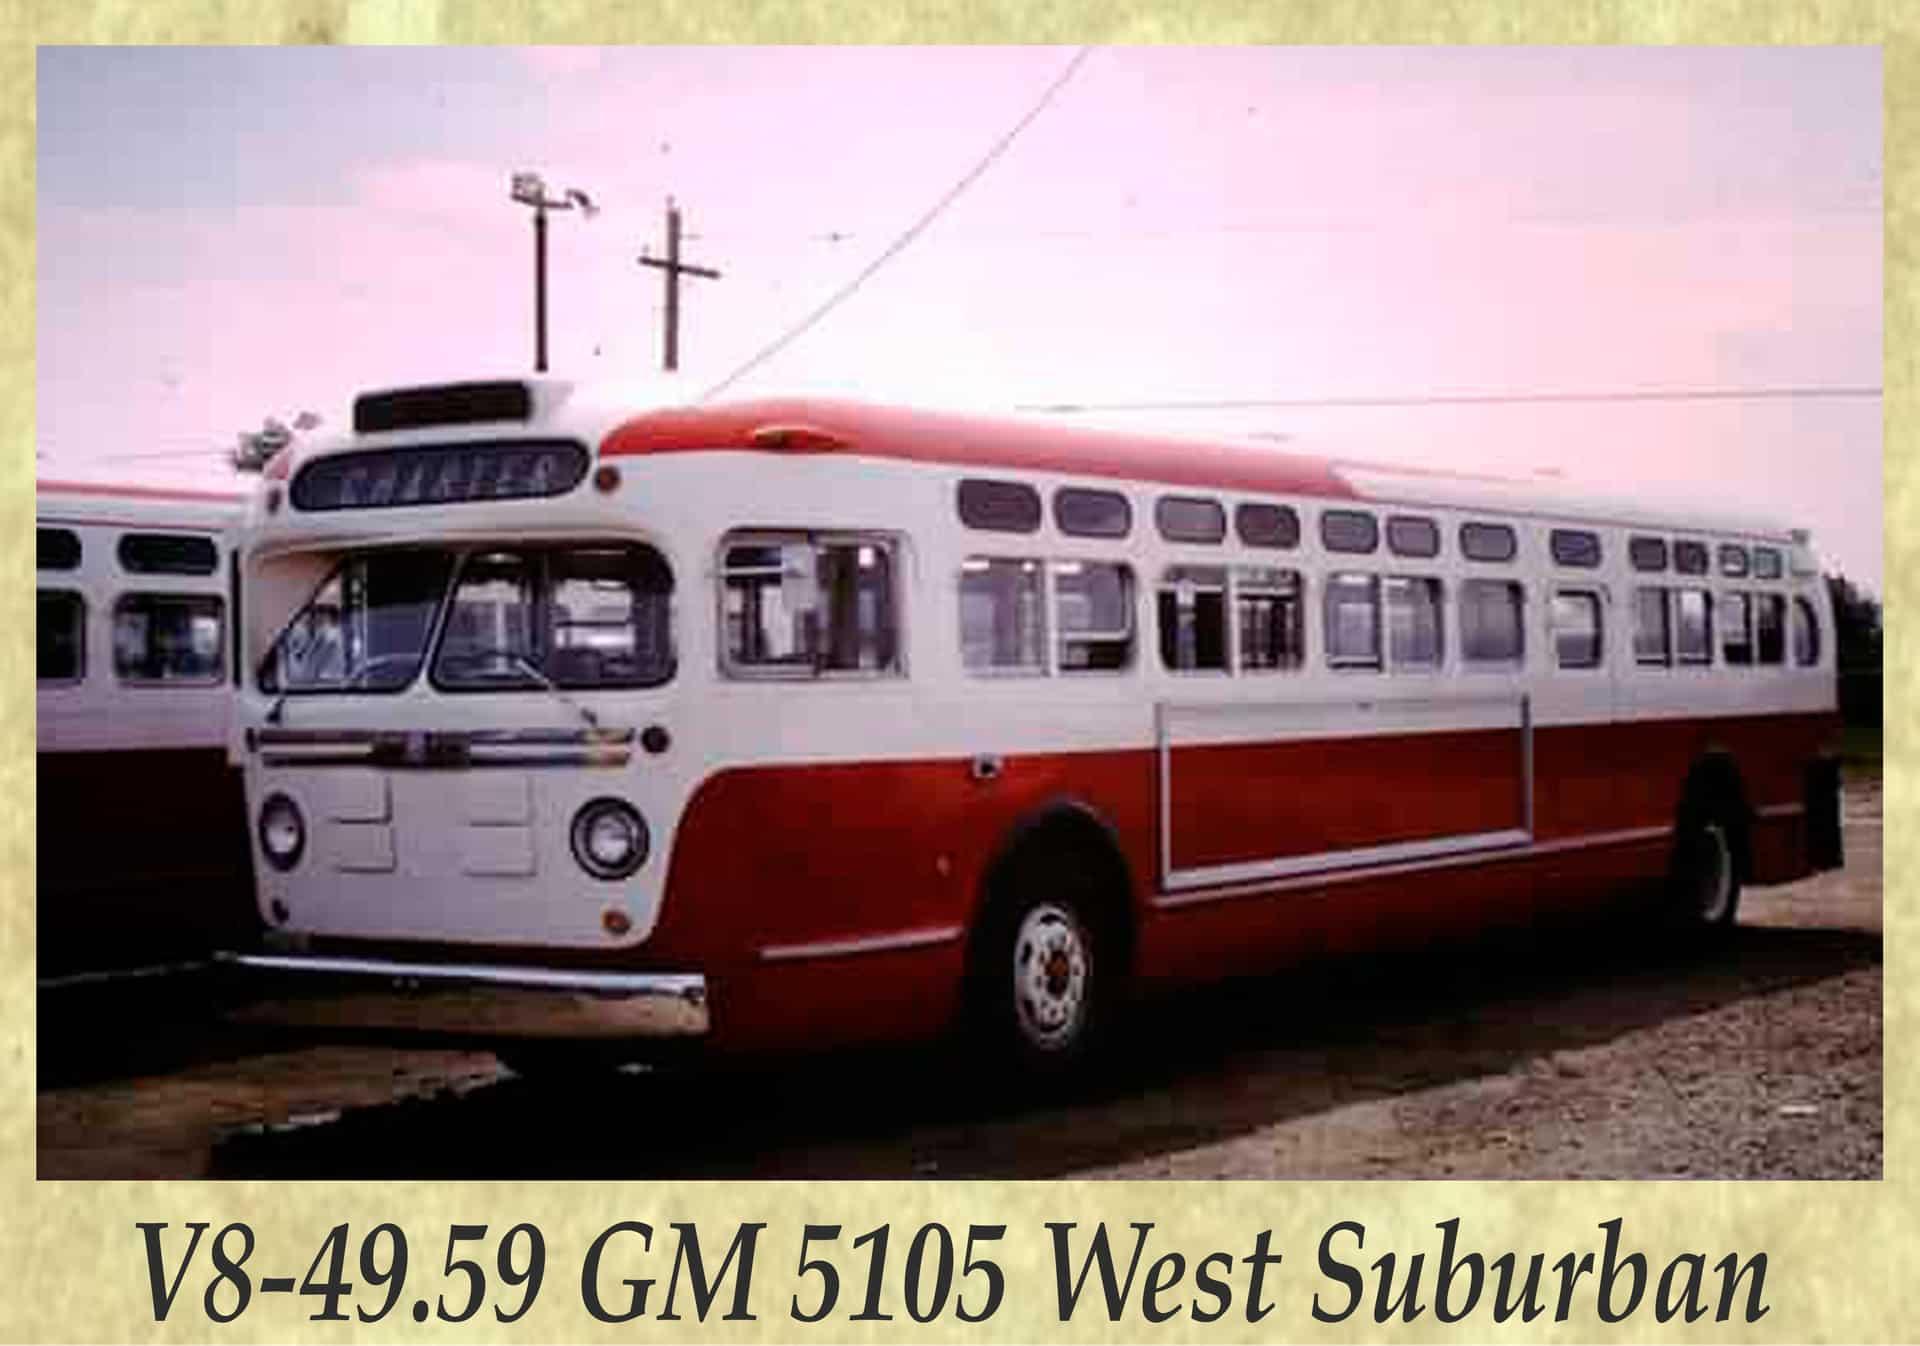 V8-49.59 GM 5105 West Suburban